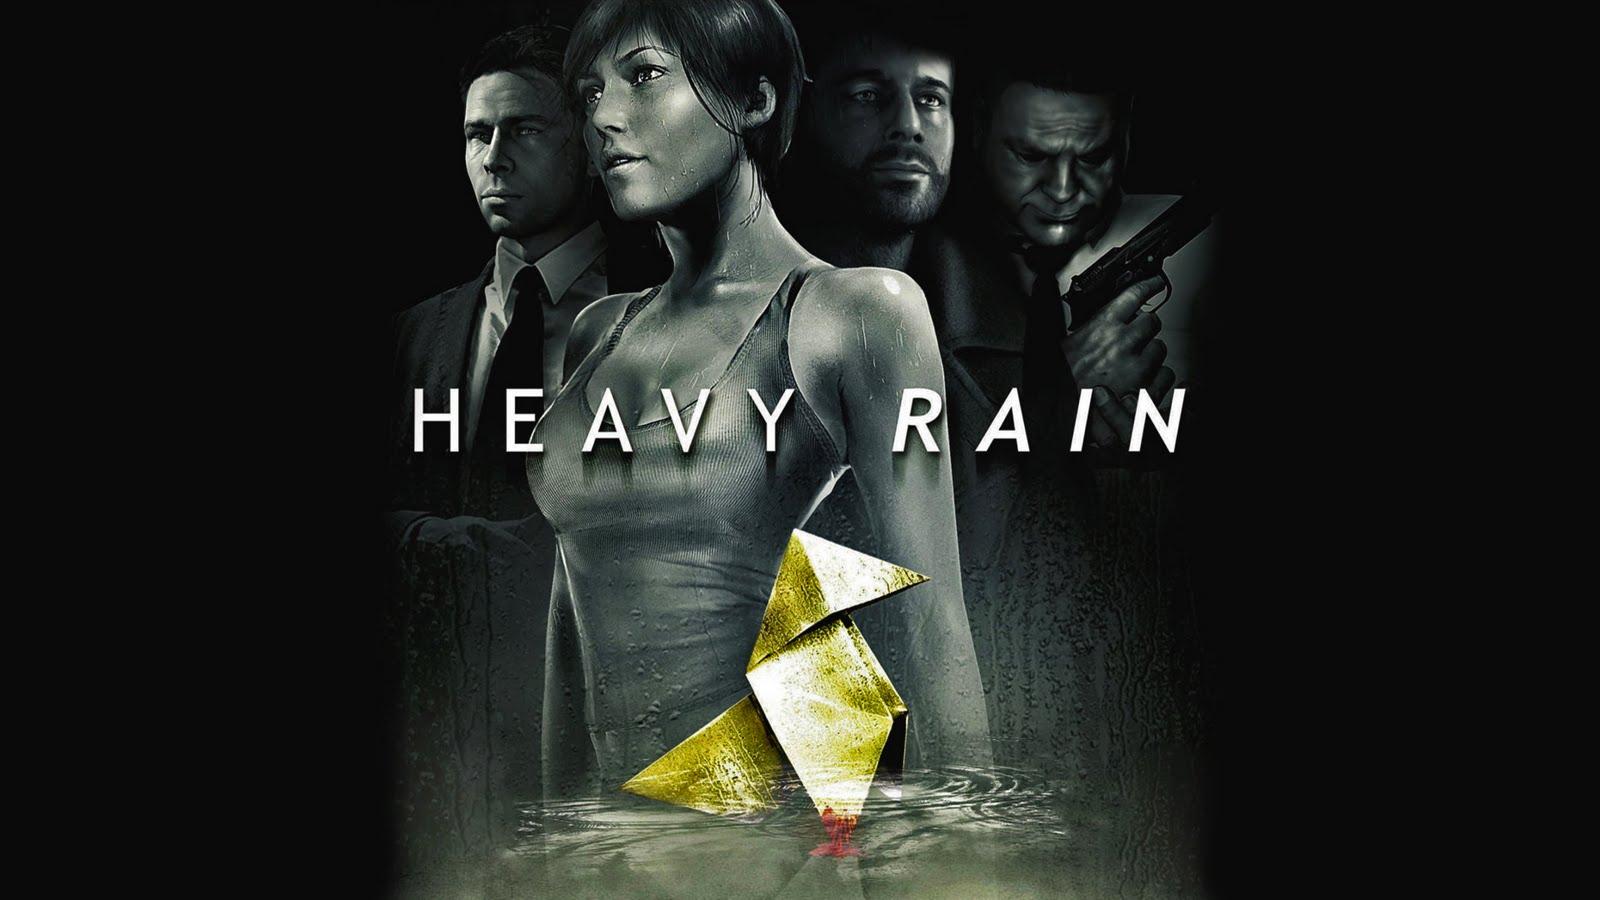 http://4.bp.blogspot.com/_3VnbSvbL2tE/TCAv4xJGkYI/AAAAAAAAASI/s6ybvTwLaGA/s1600/Heavy-Rain-Wallpaper-2xDxD.jpg